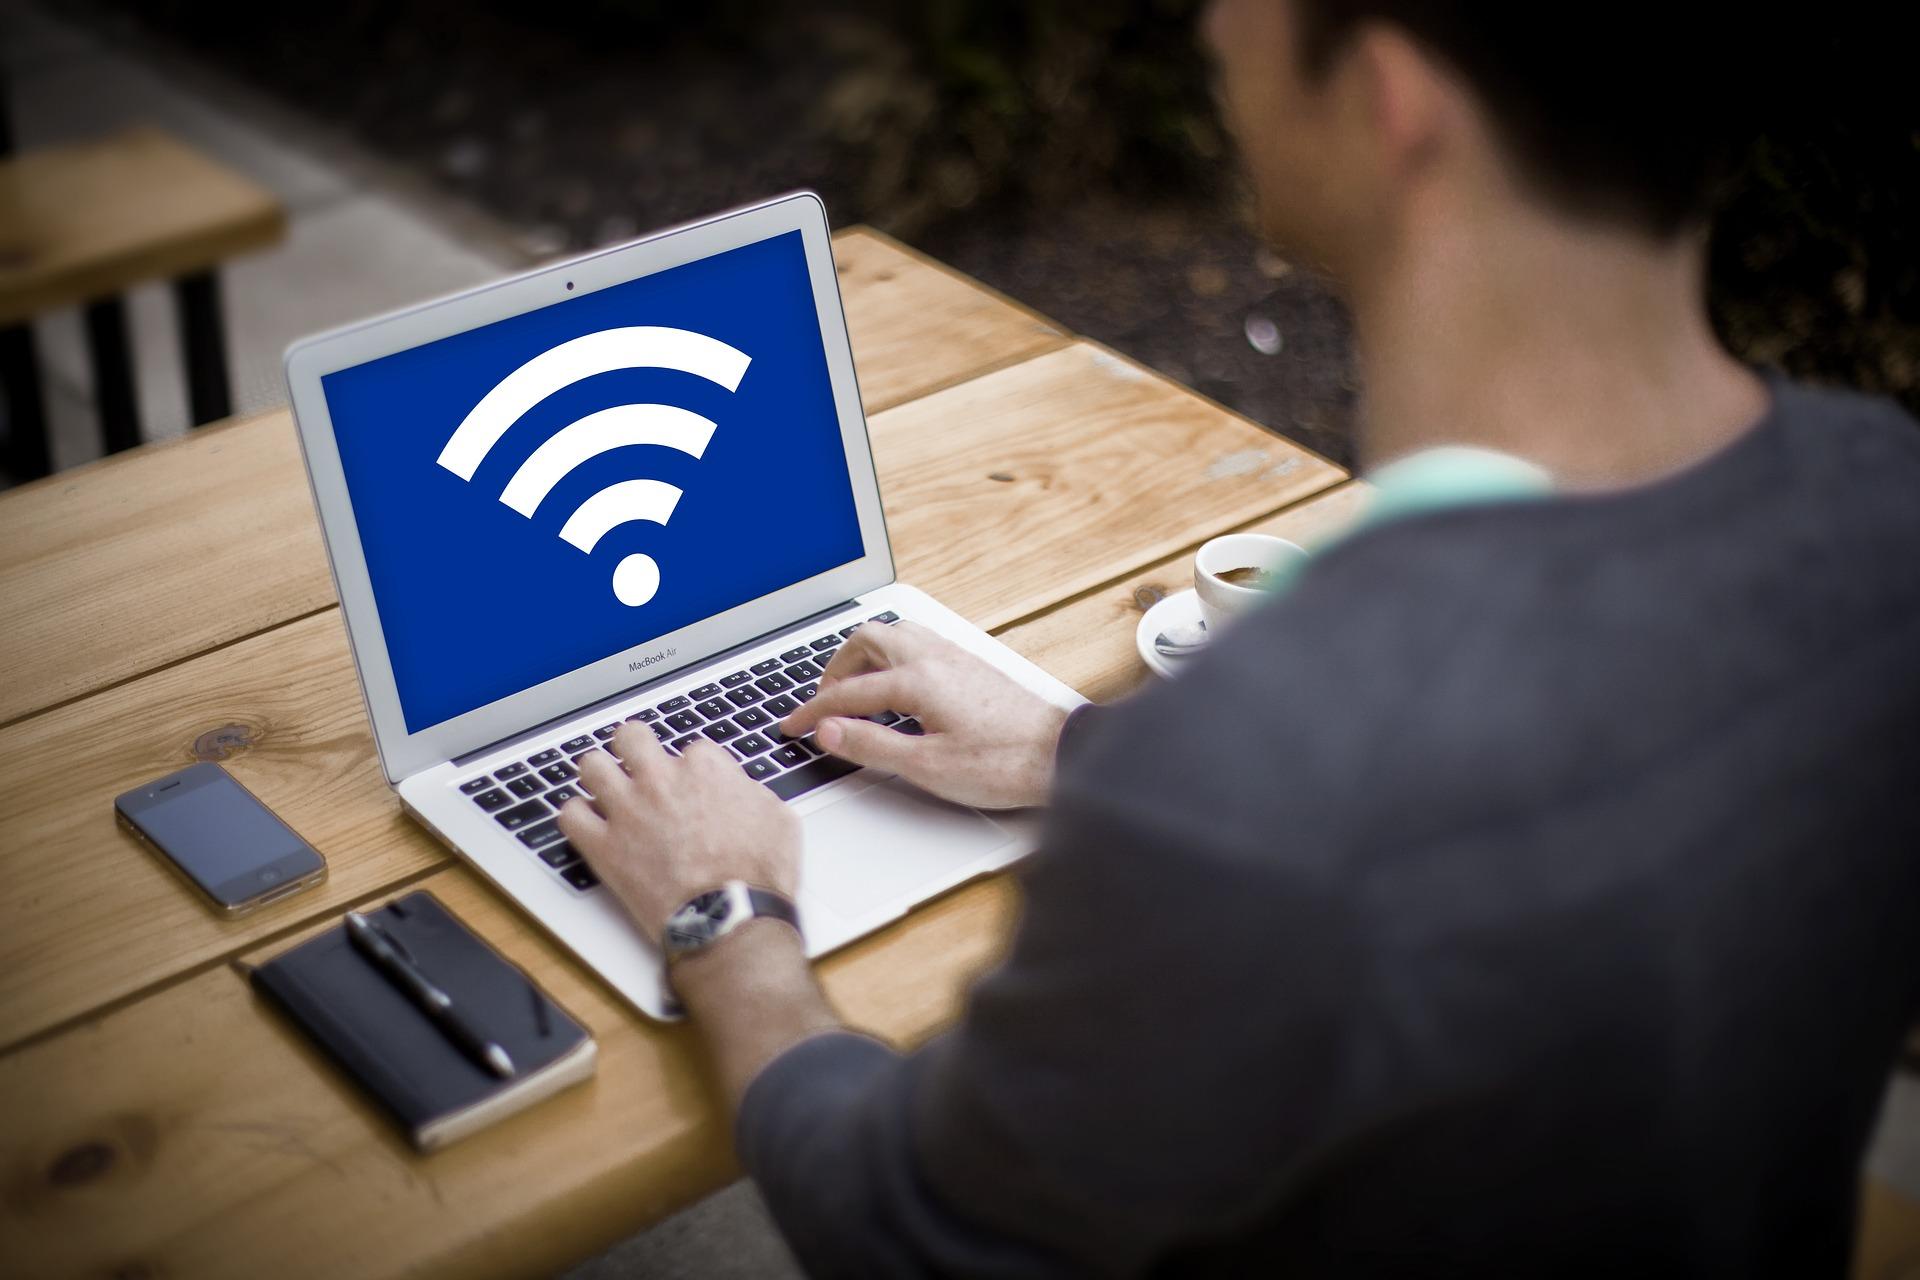 Ростелеком завершил разработку сервиса мониторинга Wi-Fi сети 1